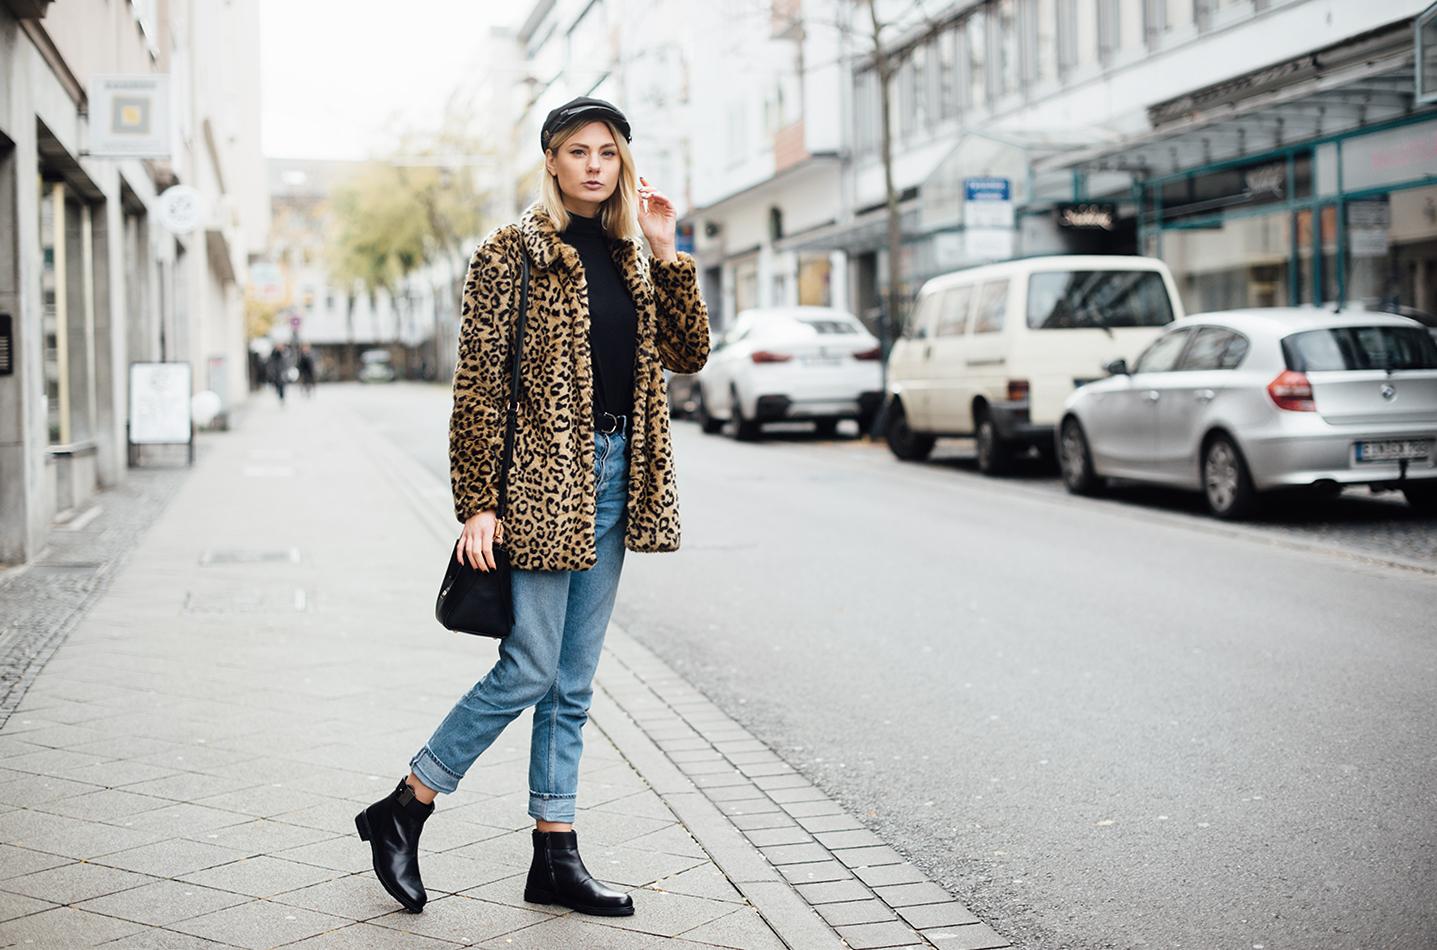 leojacke-zara_mom-jeans_outfit_inspiration_fashionblog_modeblog_kiamisu-13